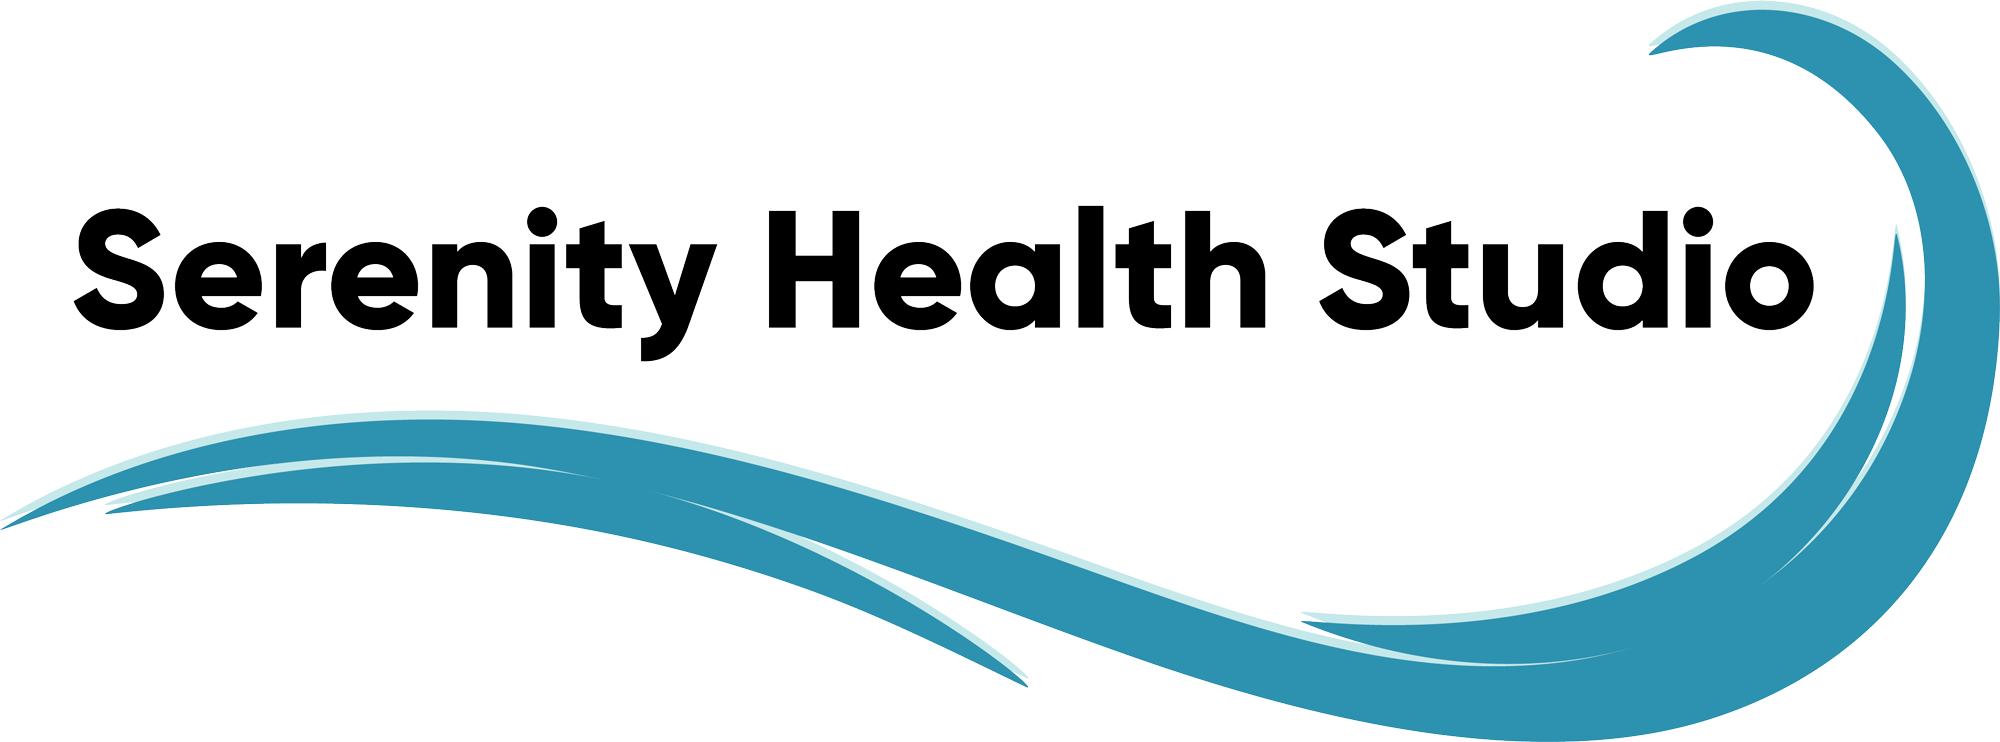 Serenity Health Studio